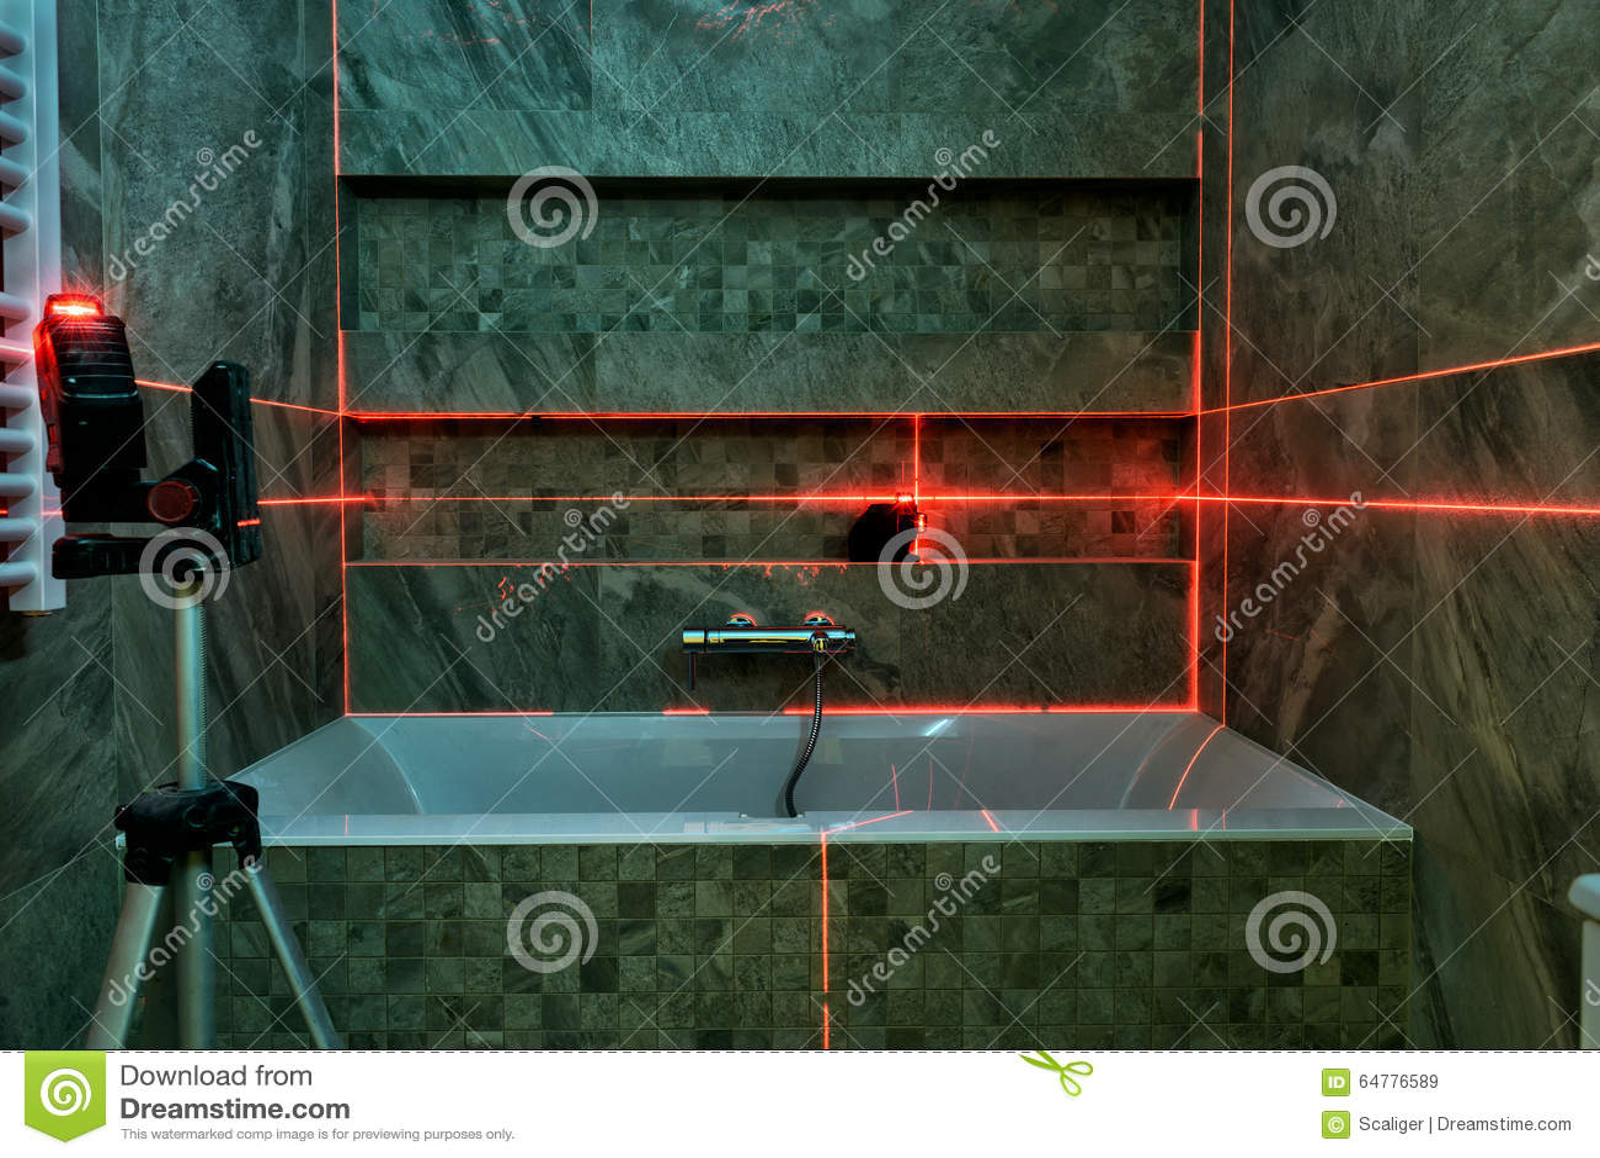 Laser measurement during bathroom renovation stock photo for Bathroom renovation tools